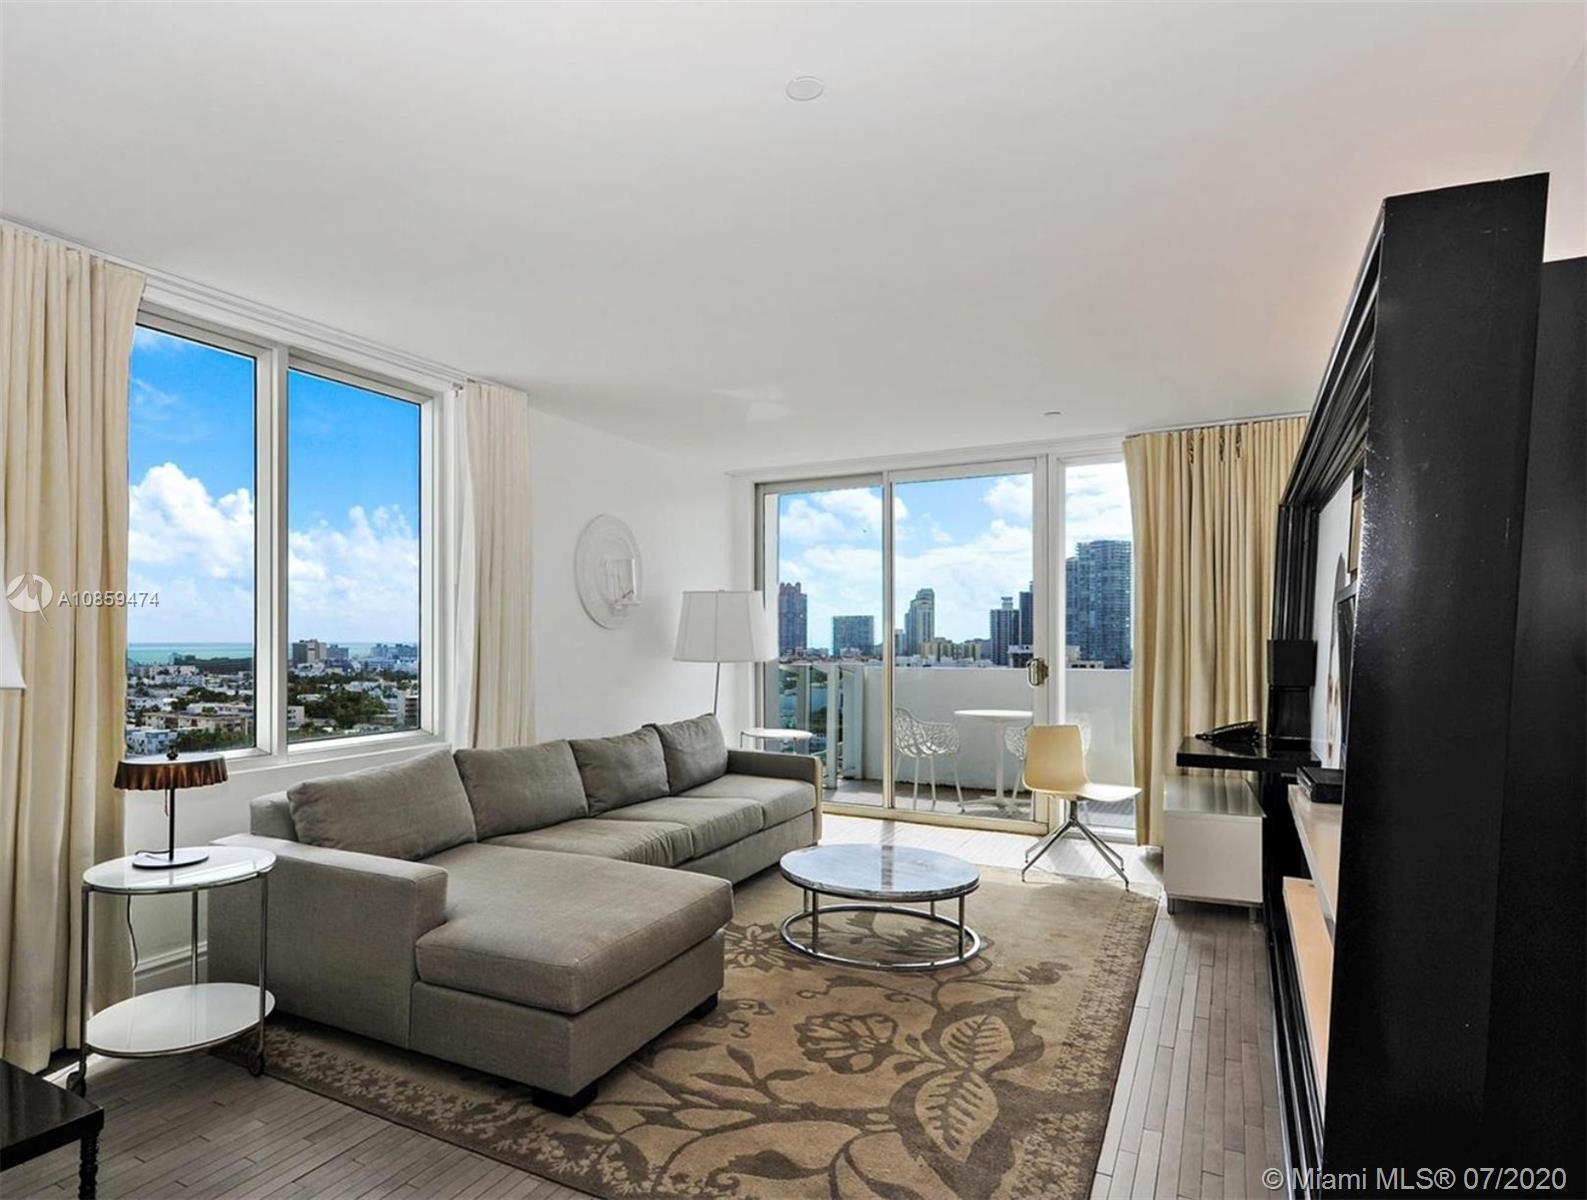 1100 West Ave #1601, Miami Beach, FL 33139 - Miami Beach, FL real estate listing